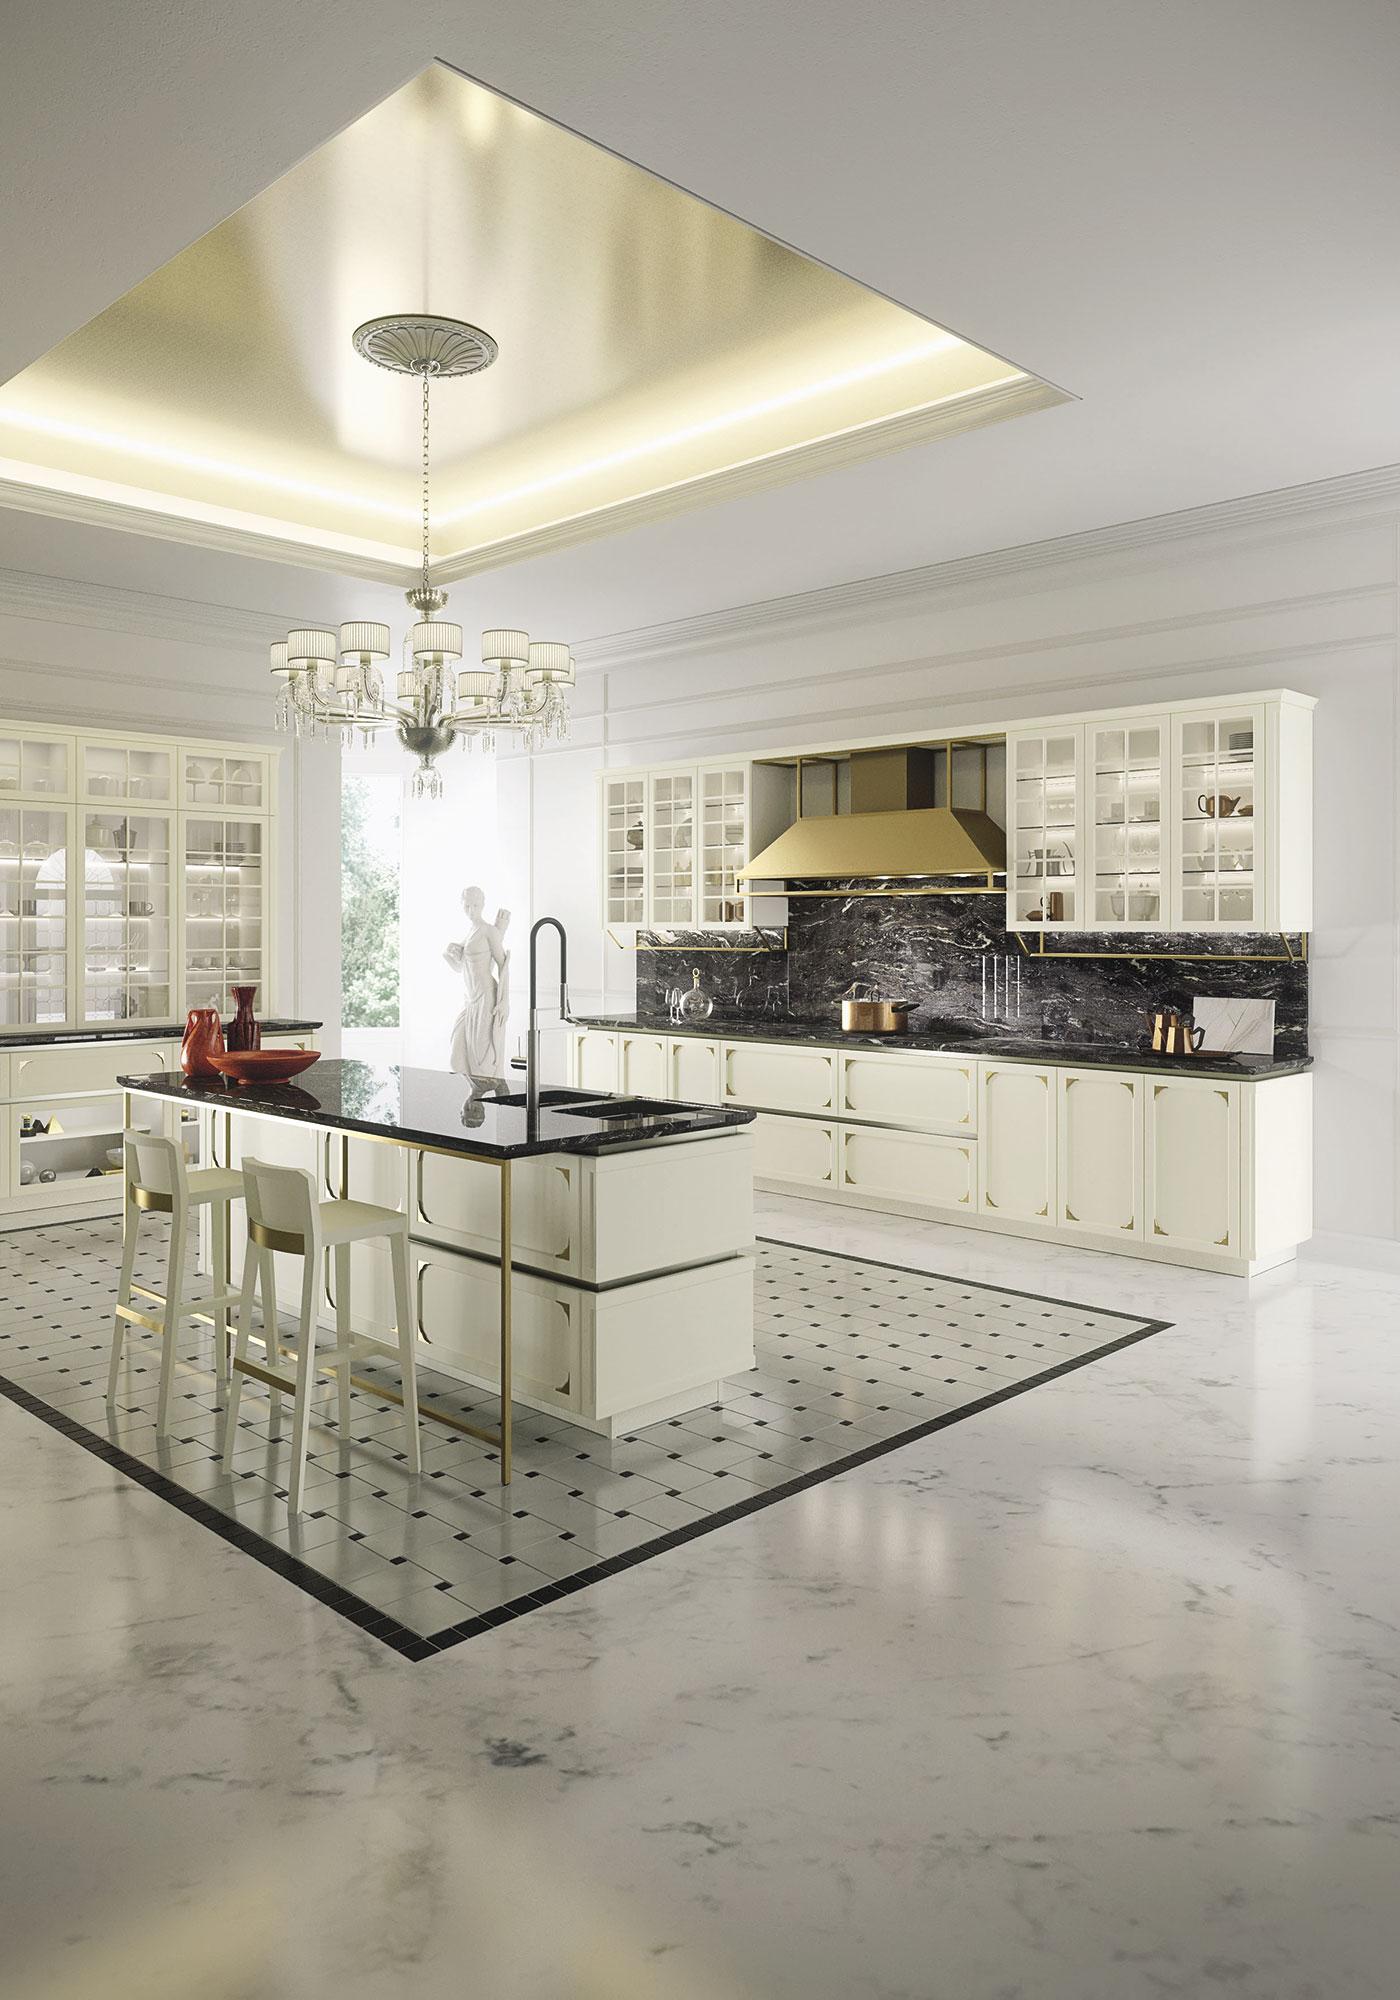 Deco Salle De Bain Beige Et Marron ~ Cuisine Moderne Kelly Snaidero Mktop